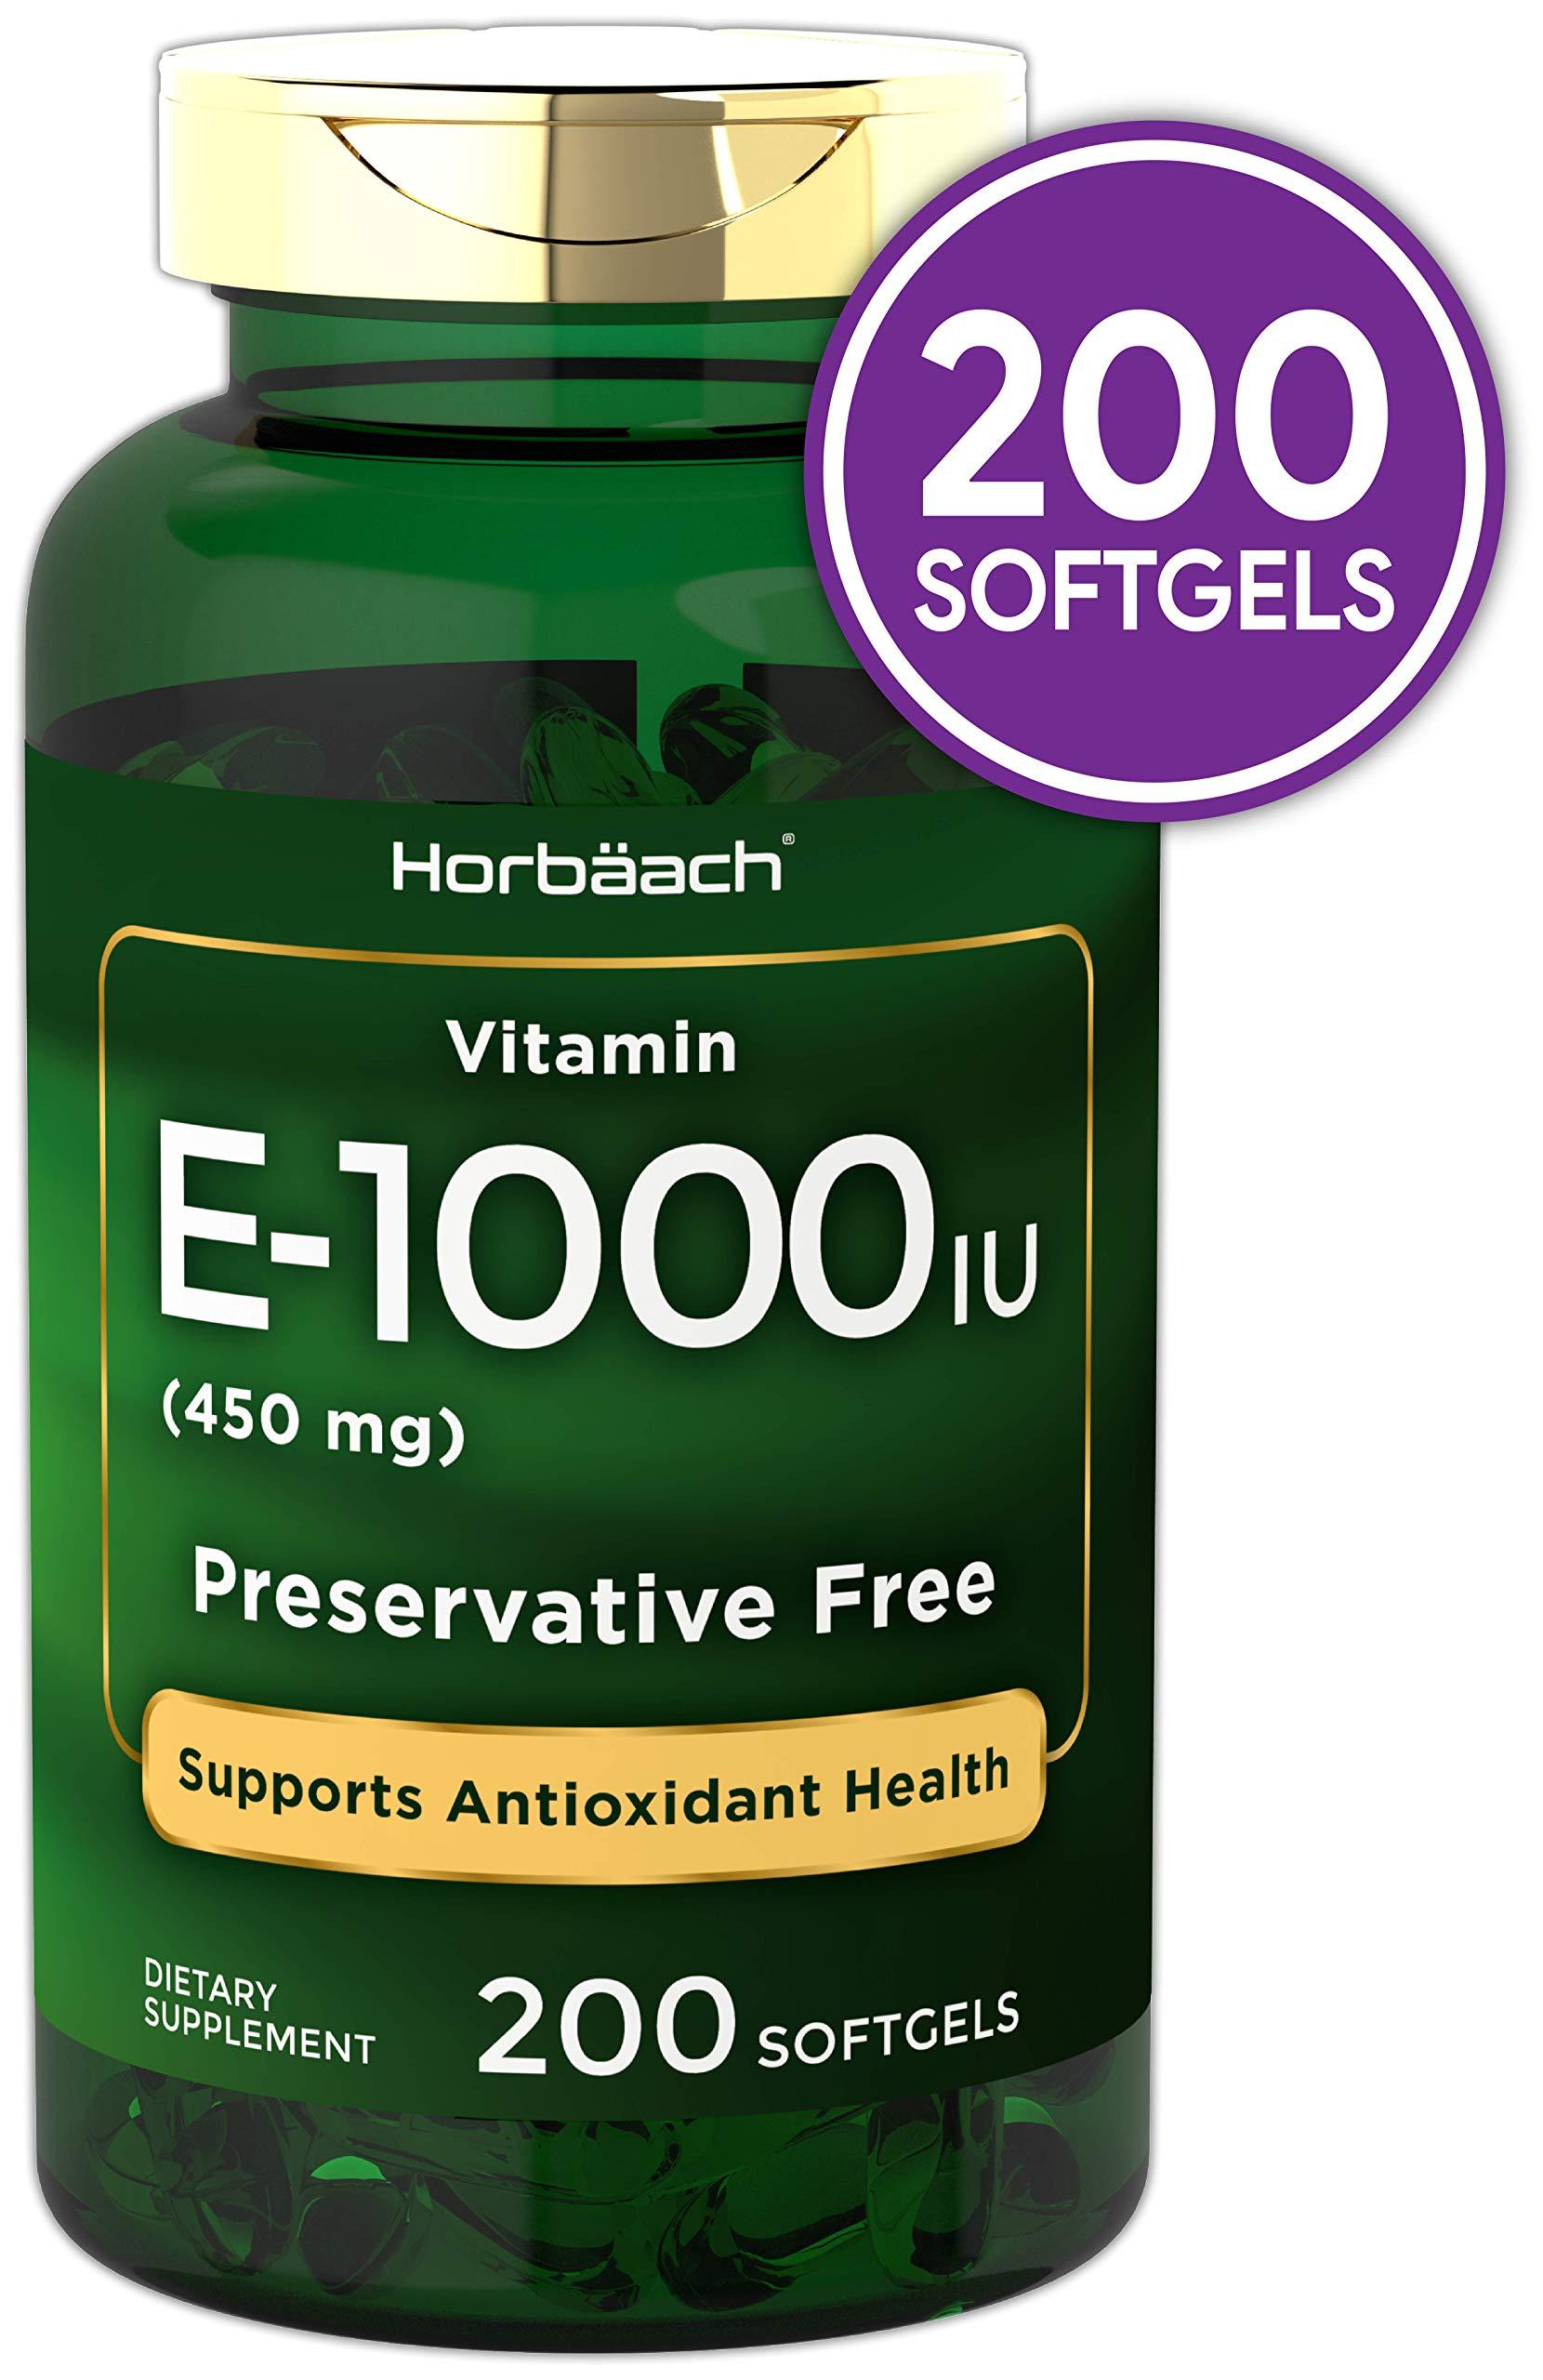 Horbaach Vitamin E 1000 IU 200 Softgel Capsules | Non-GMO, Gluten Free, Preservative Free